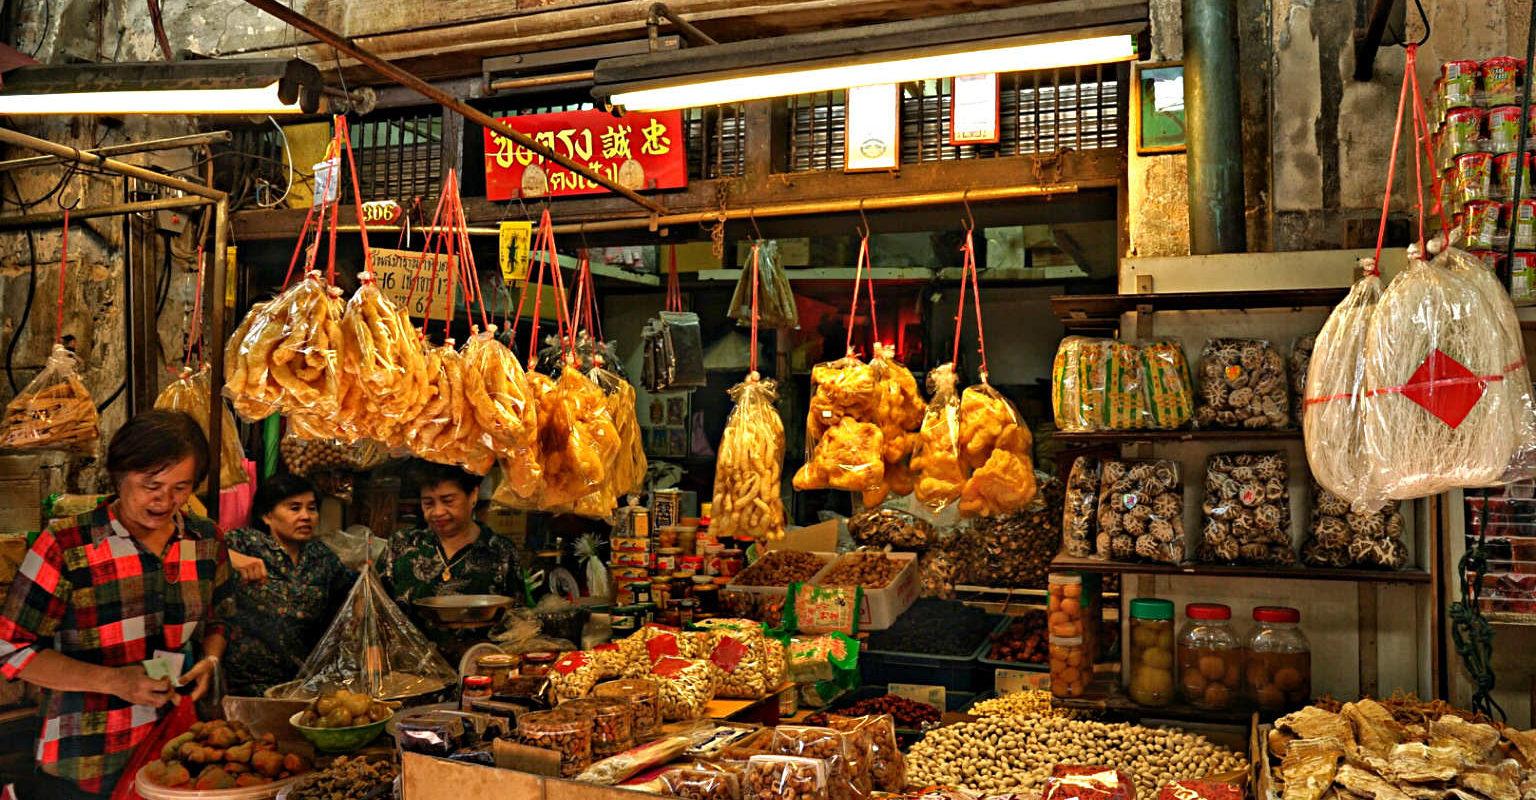 Marktkraam in Chinatown, Yaowarat Road in Bangkok